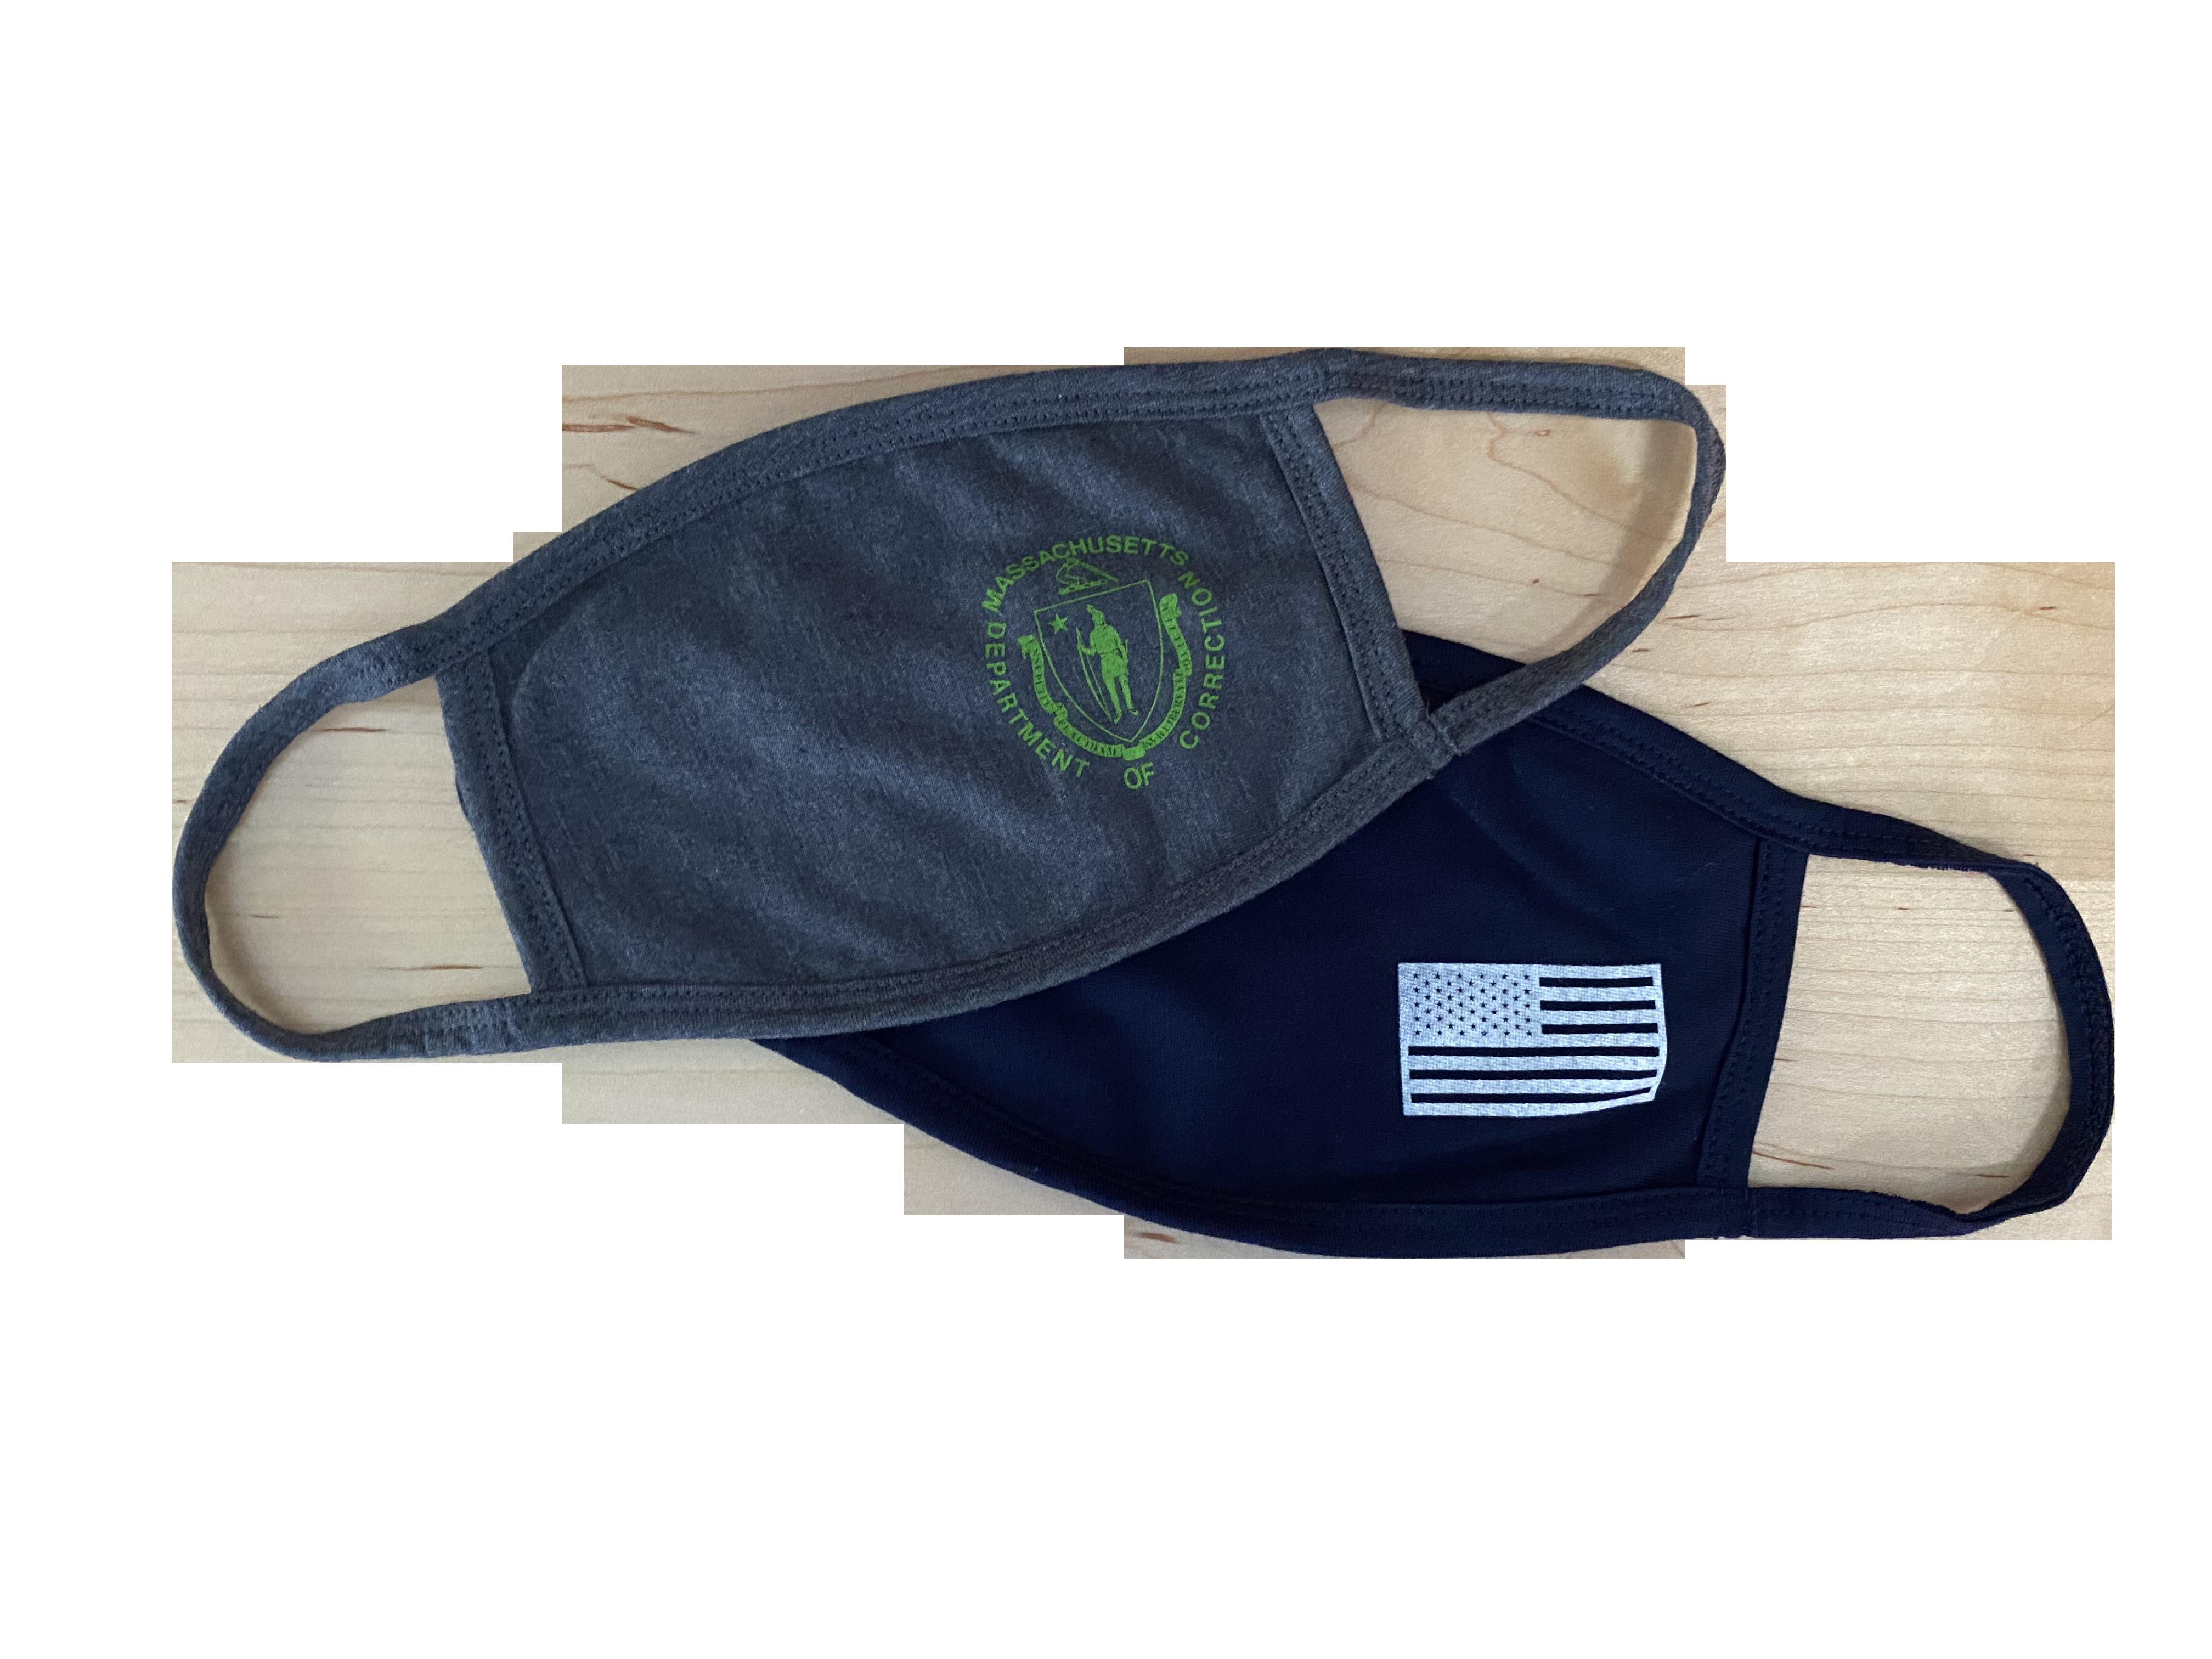 https://0901.nccdn.net/4_2/000/000/04d/add/doc-and-flag-big-masks.png